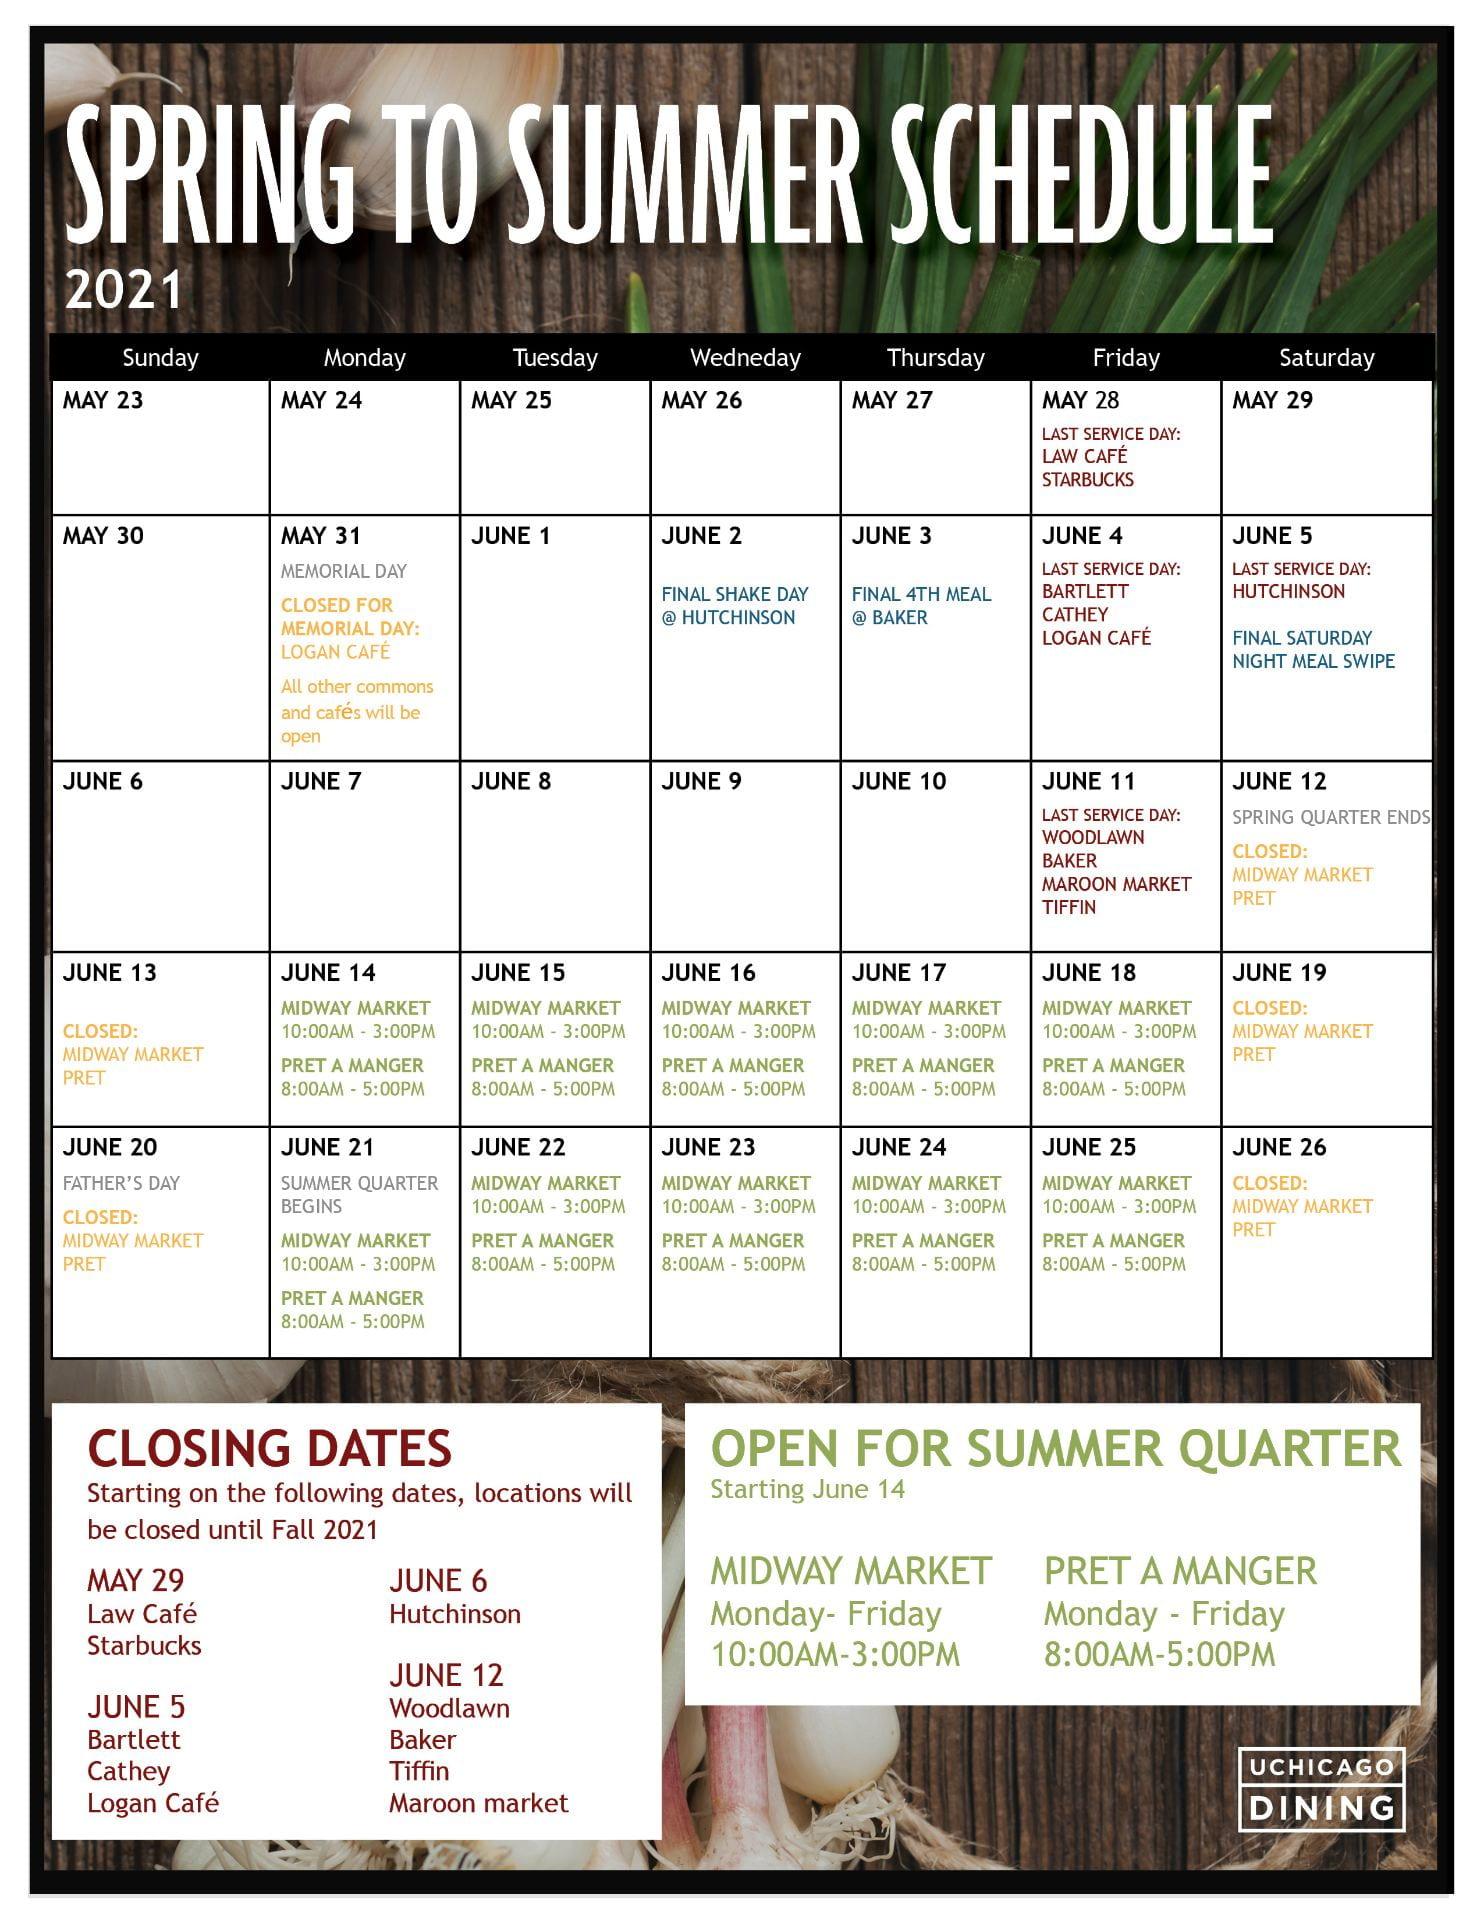 Spring to Summer Closing Calendar